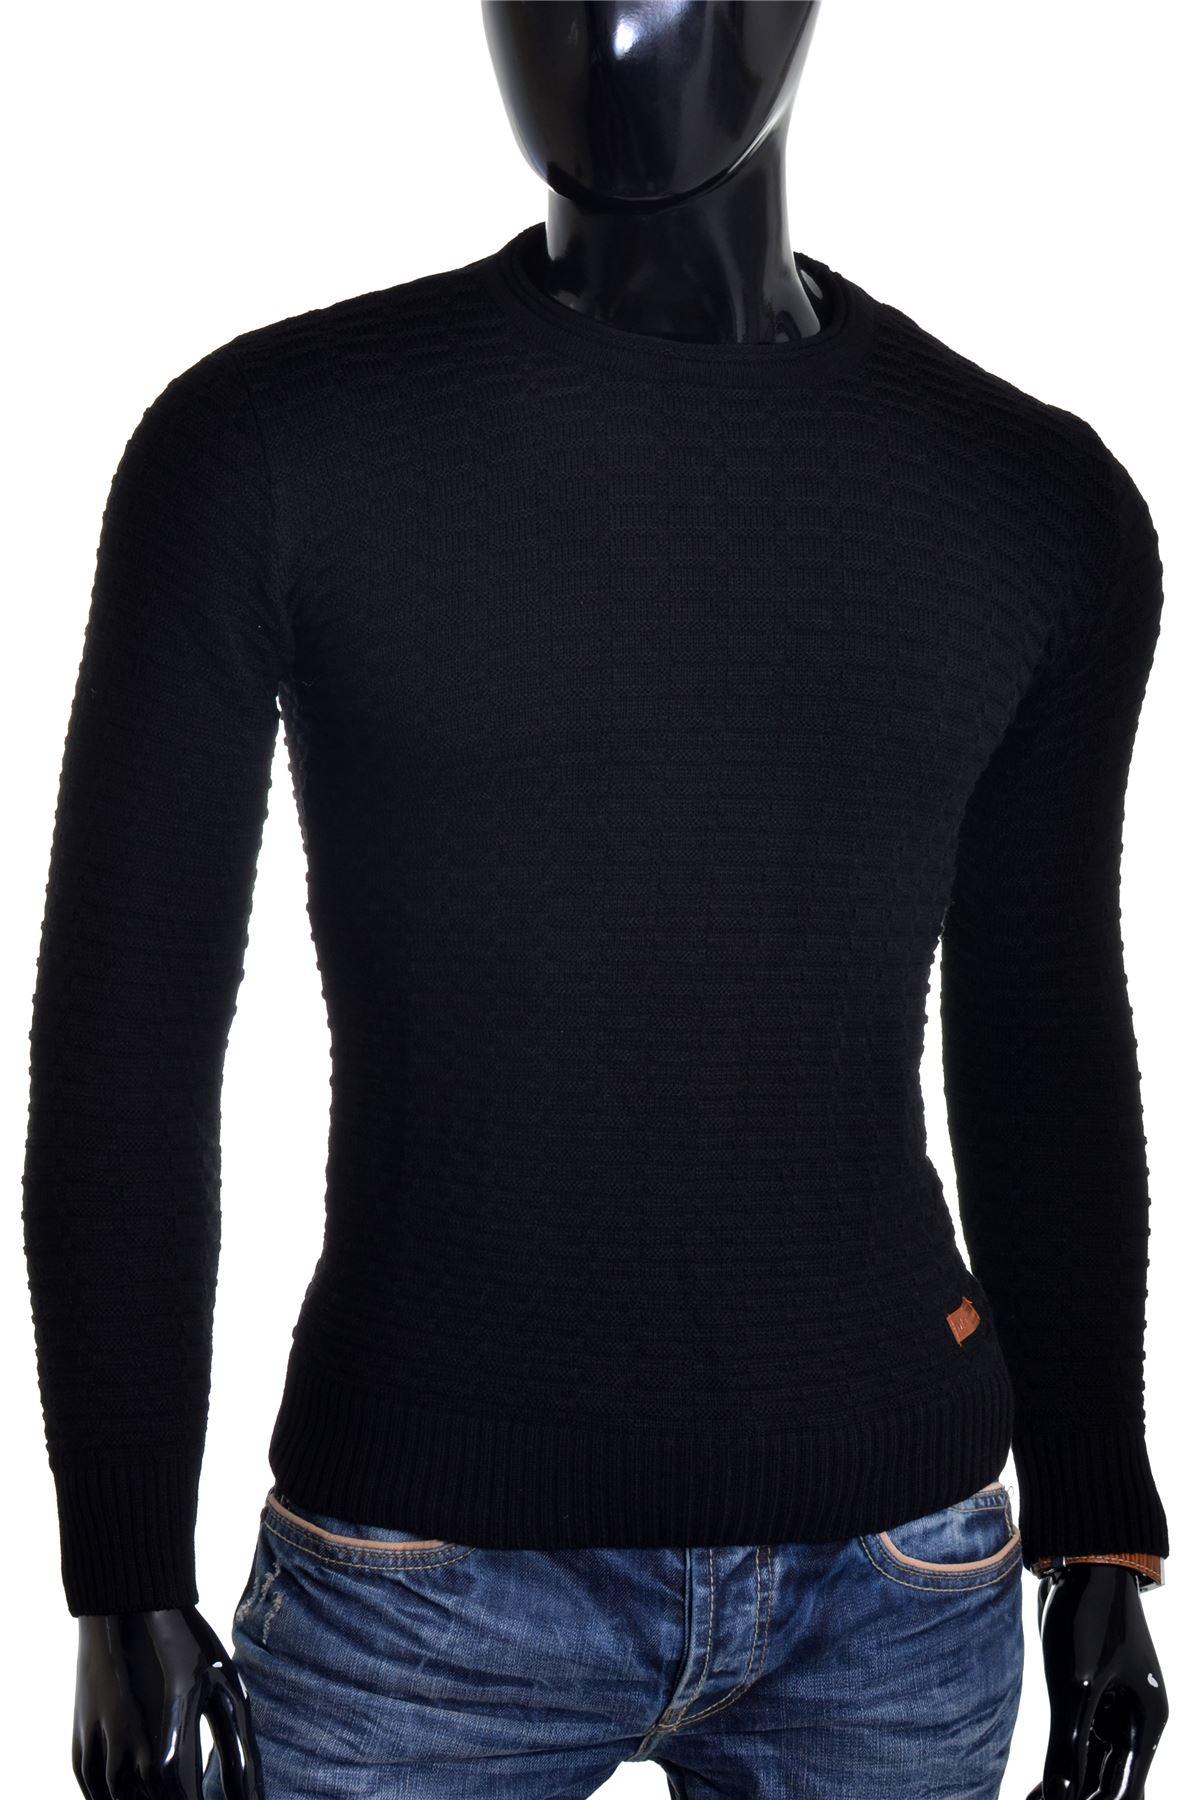 Men-039-s-Jumper-Striped-Knit-Smart-Long-Sleeve-Sweater-Crew-Neck-Top-Slim-Fitness thumbnail 8